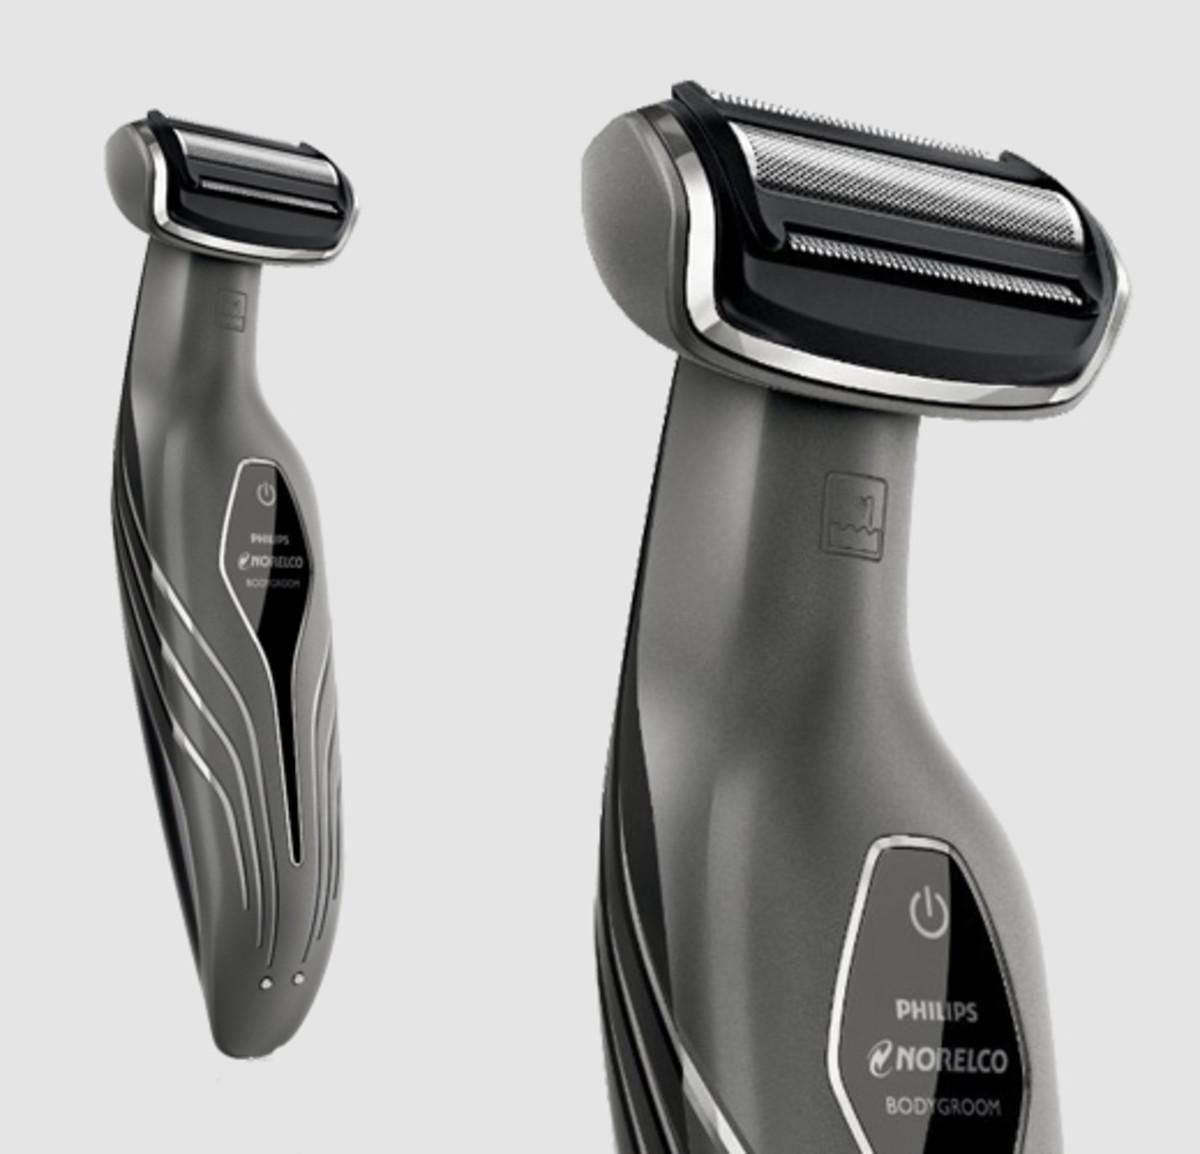 Philips Norelco Bodygroom Plus